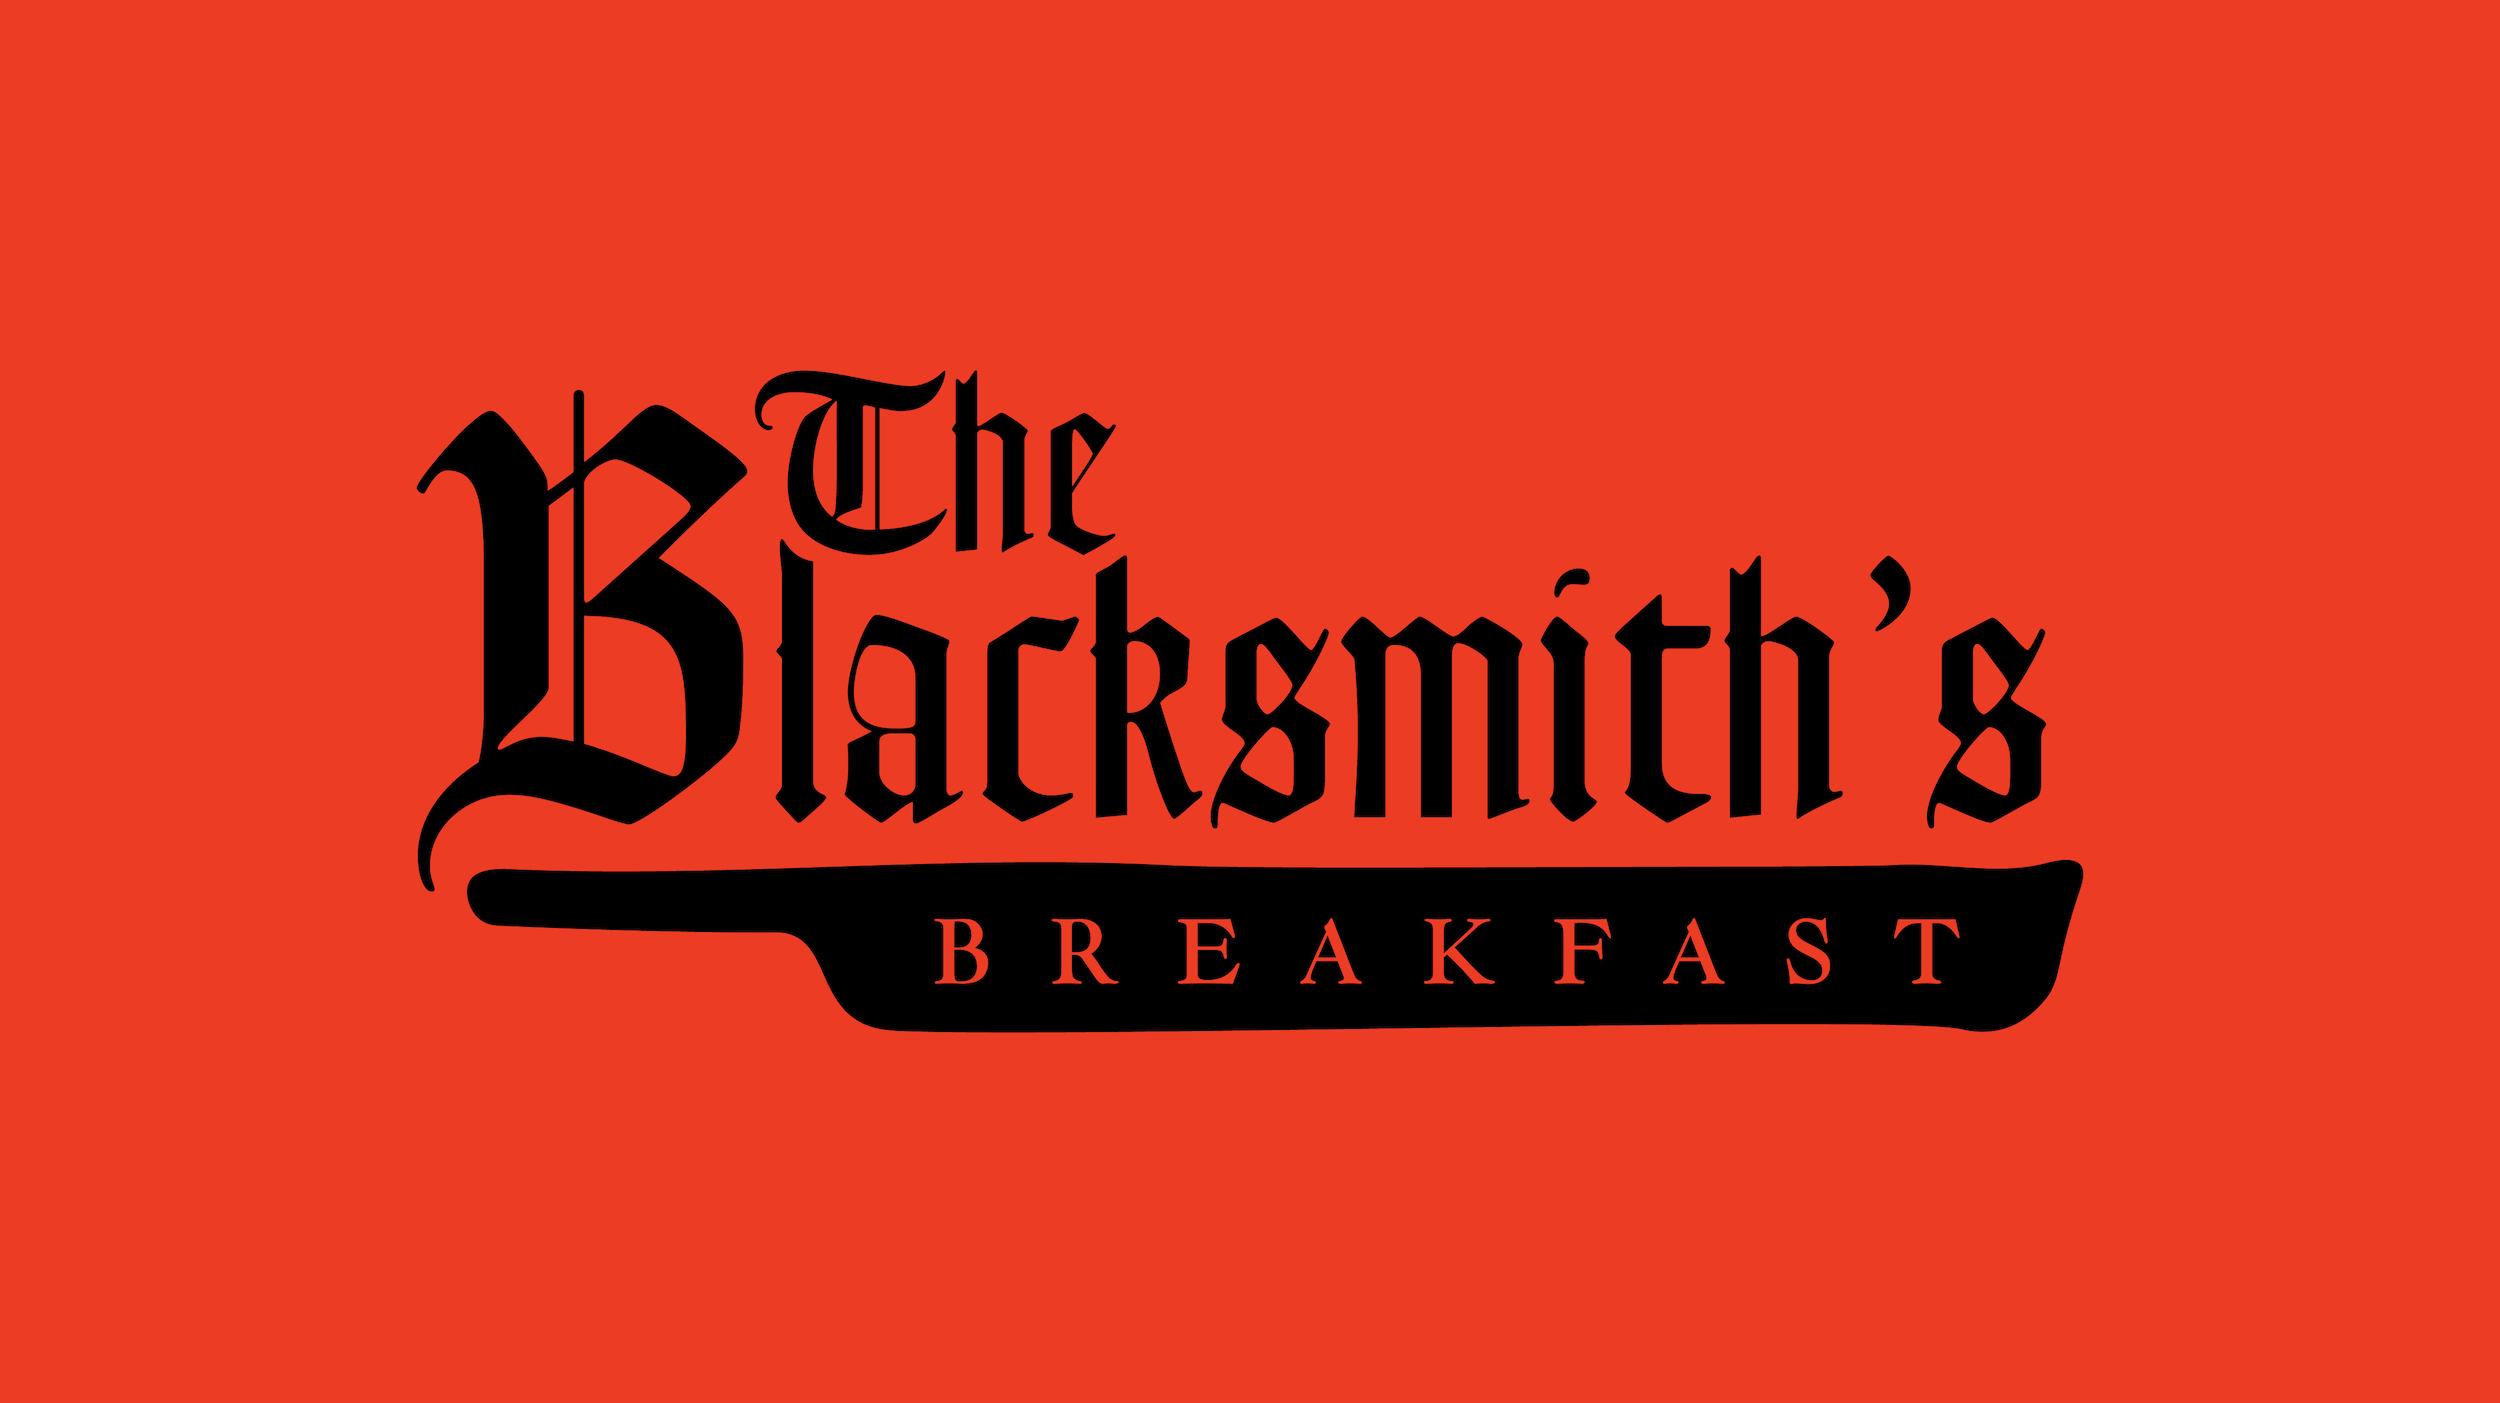 The Blacksmiths Breakfast